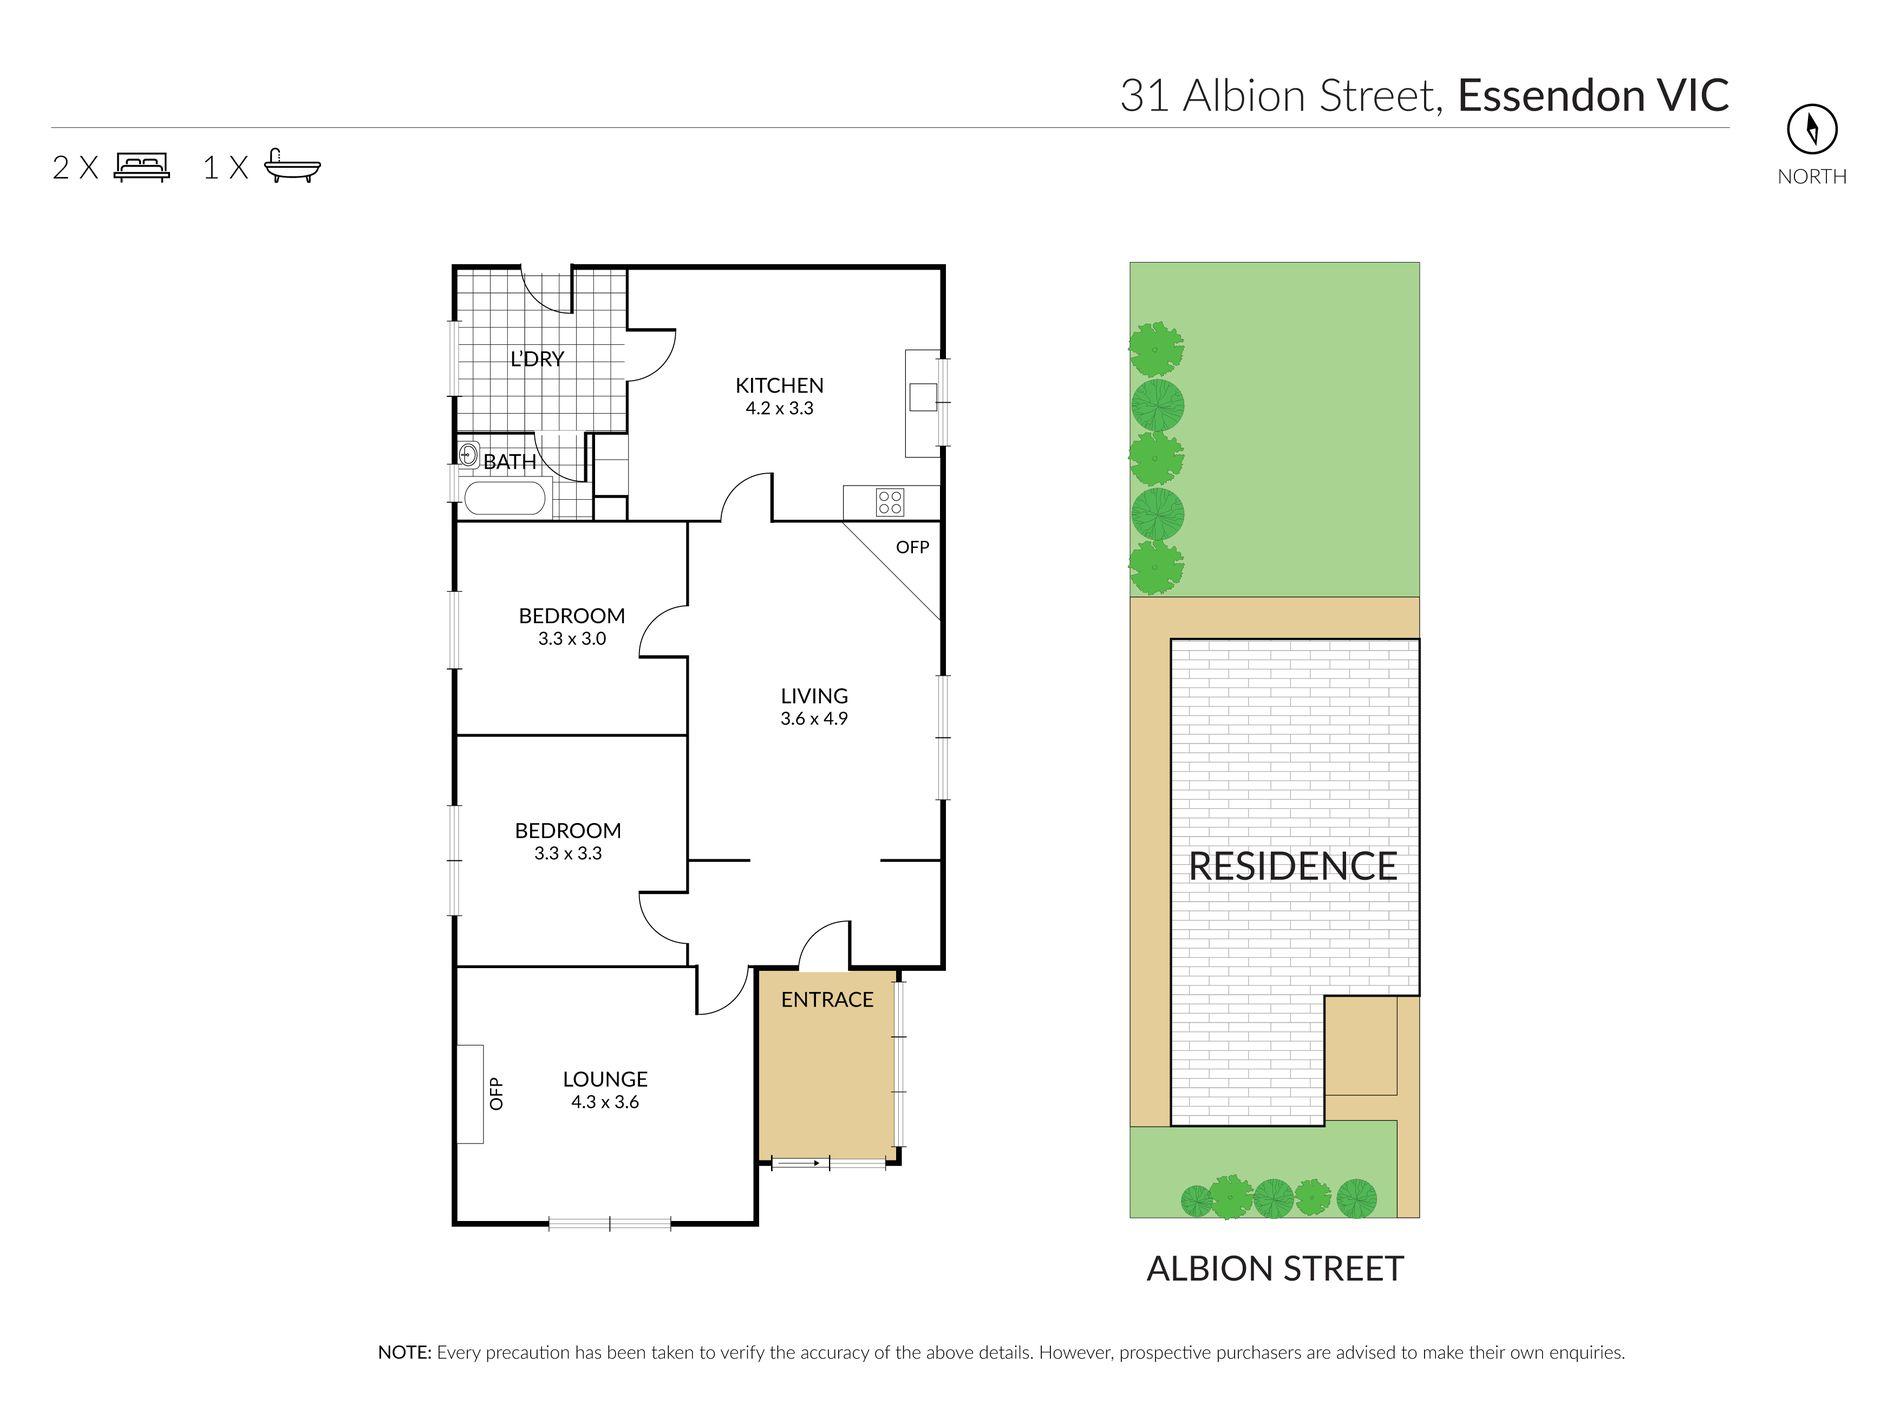 31 Albion Street, Essendon